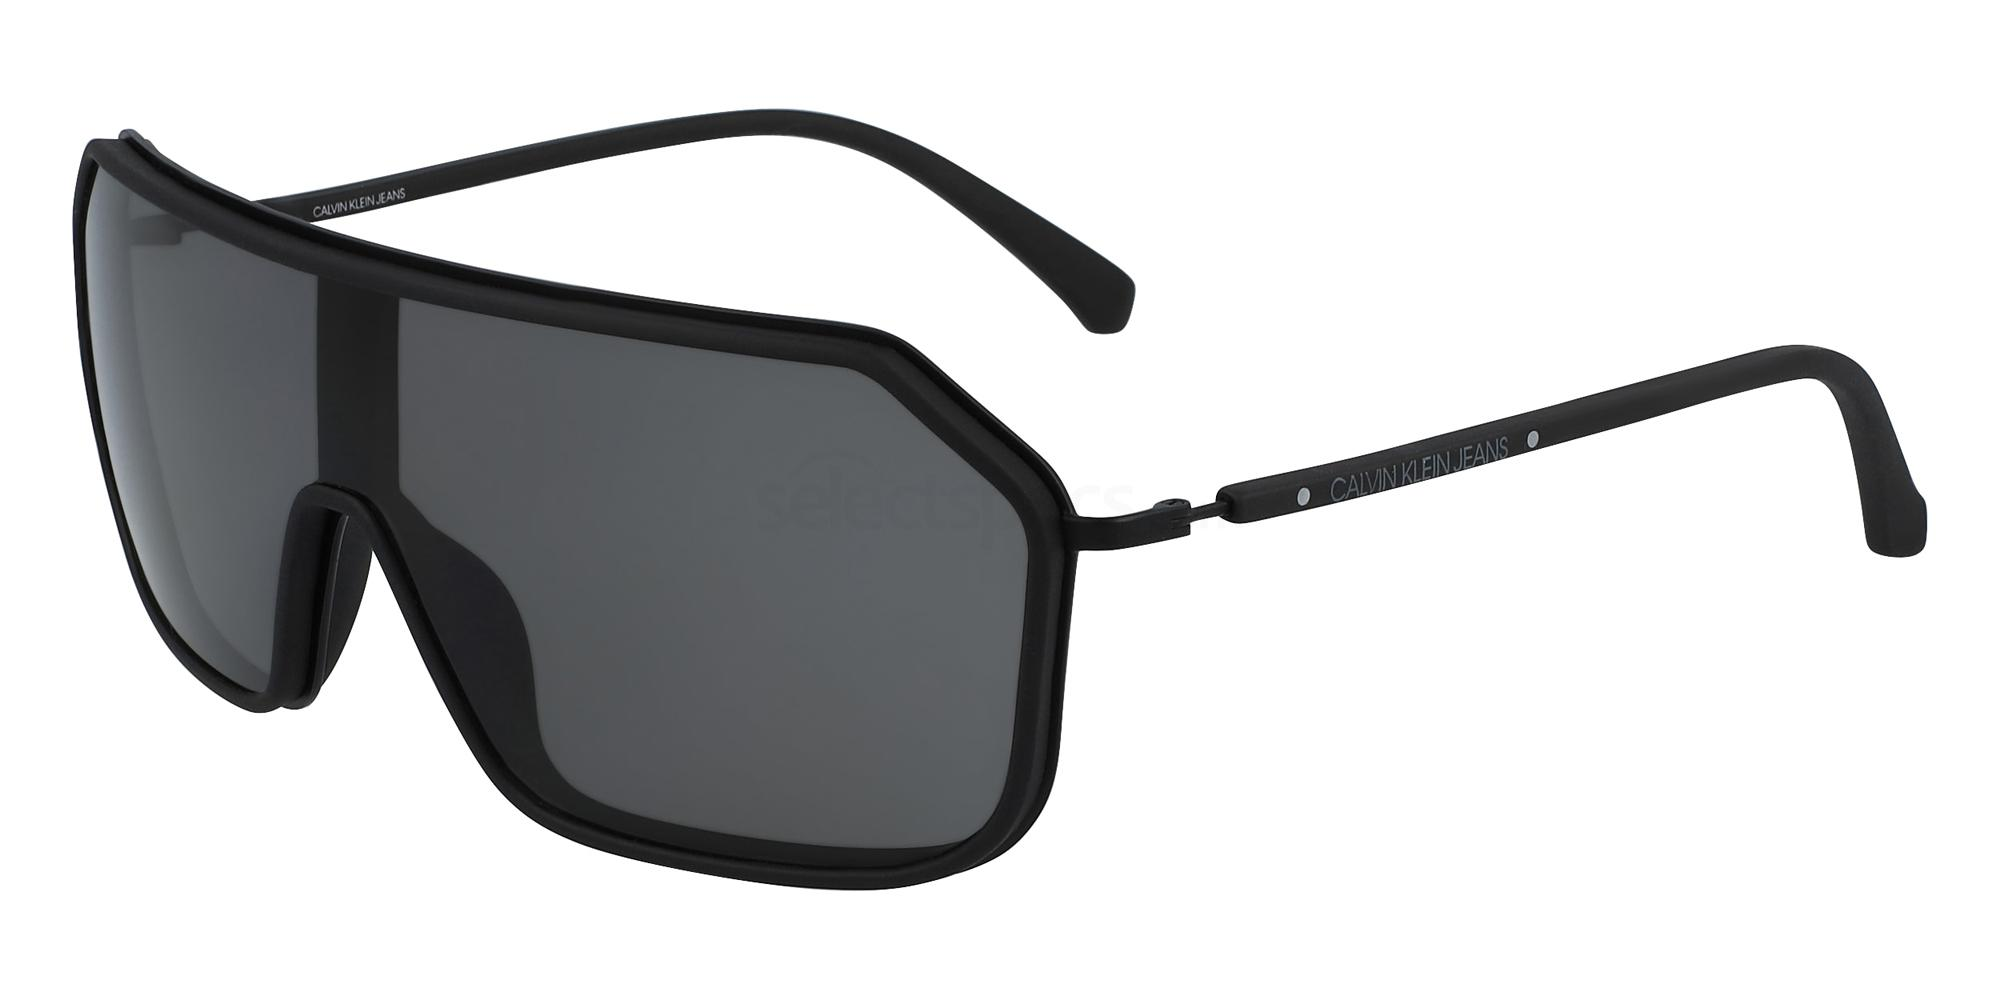 001 CKJ19307S Sunglasses, Calvin Klein Jeans